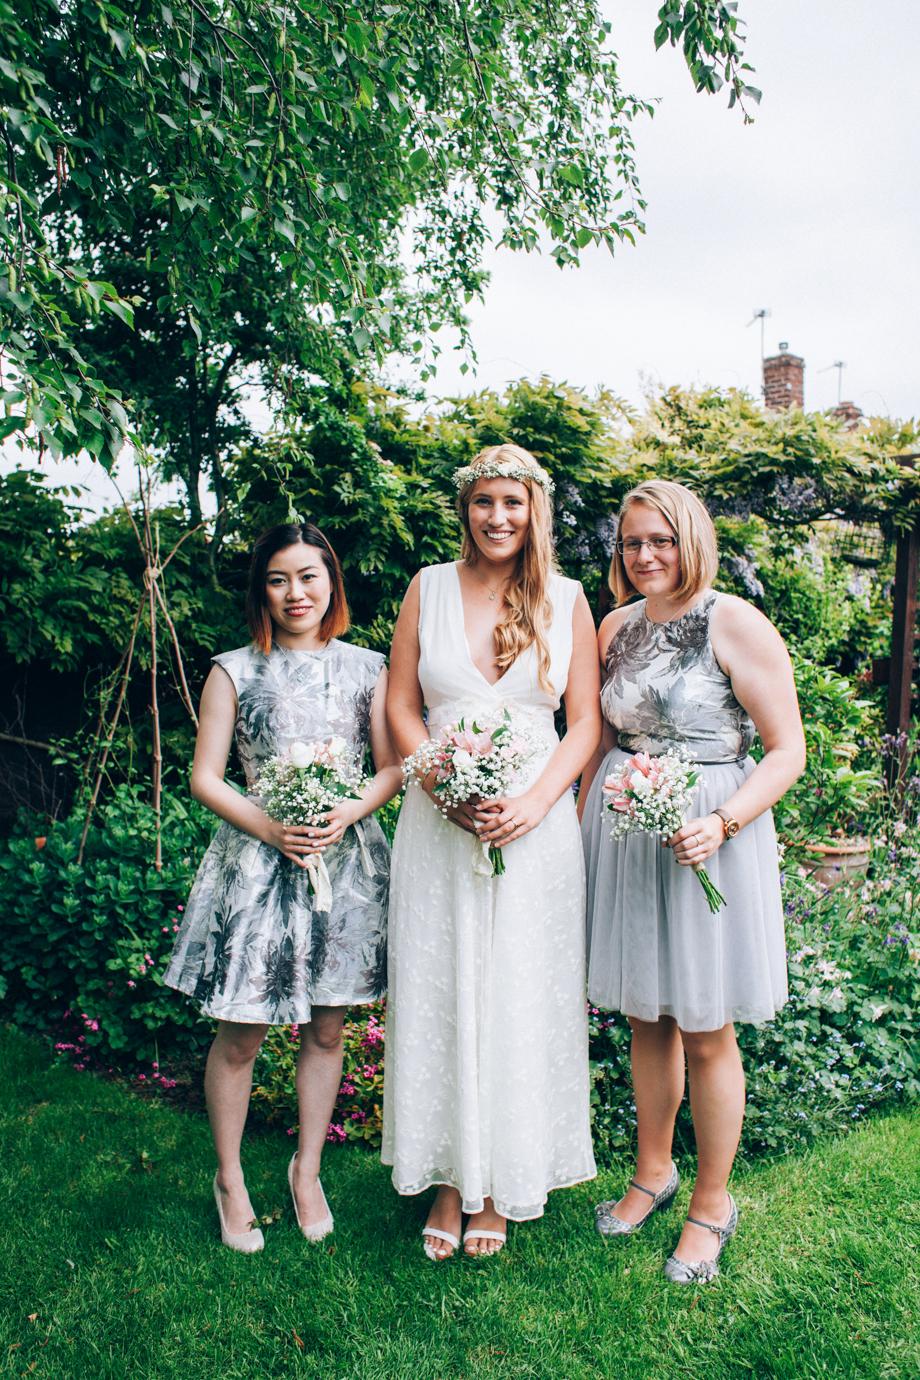 halstead-house-wedding-9